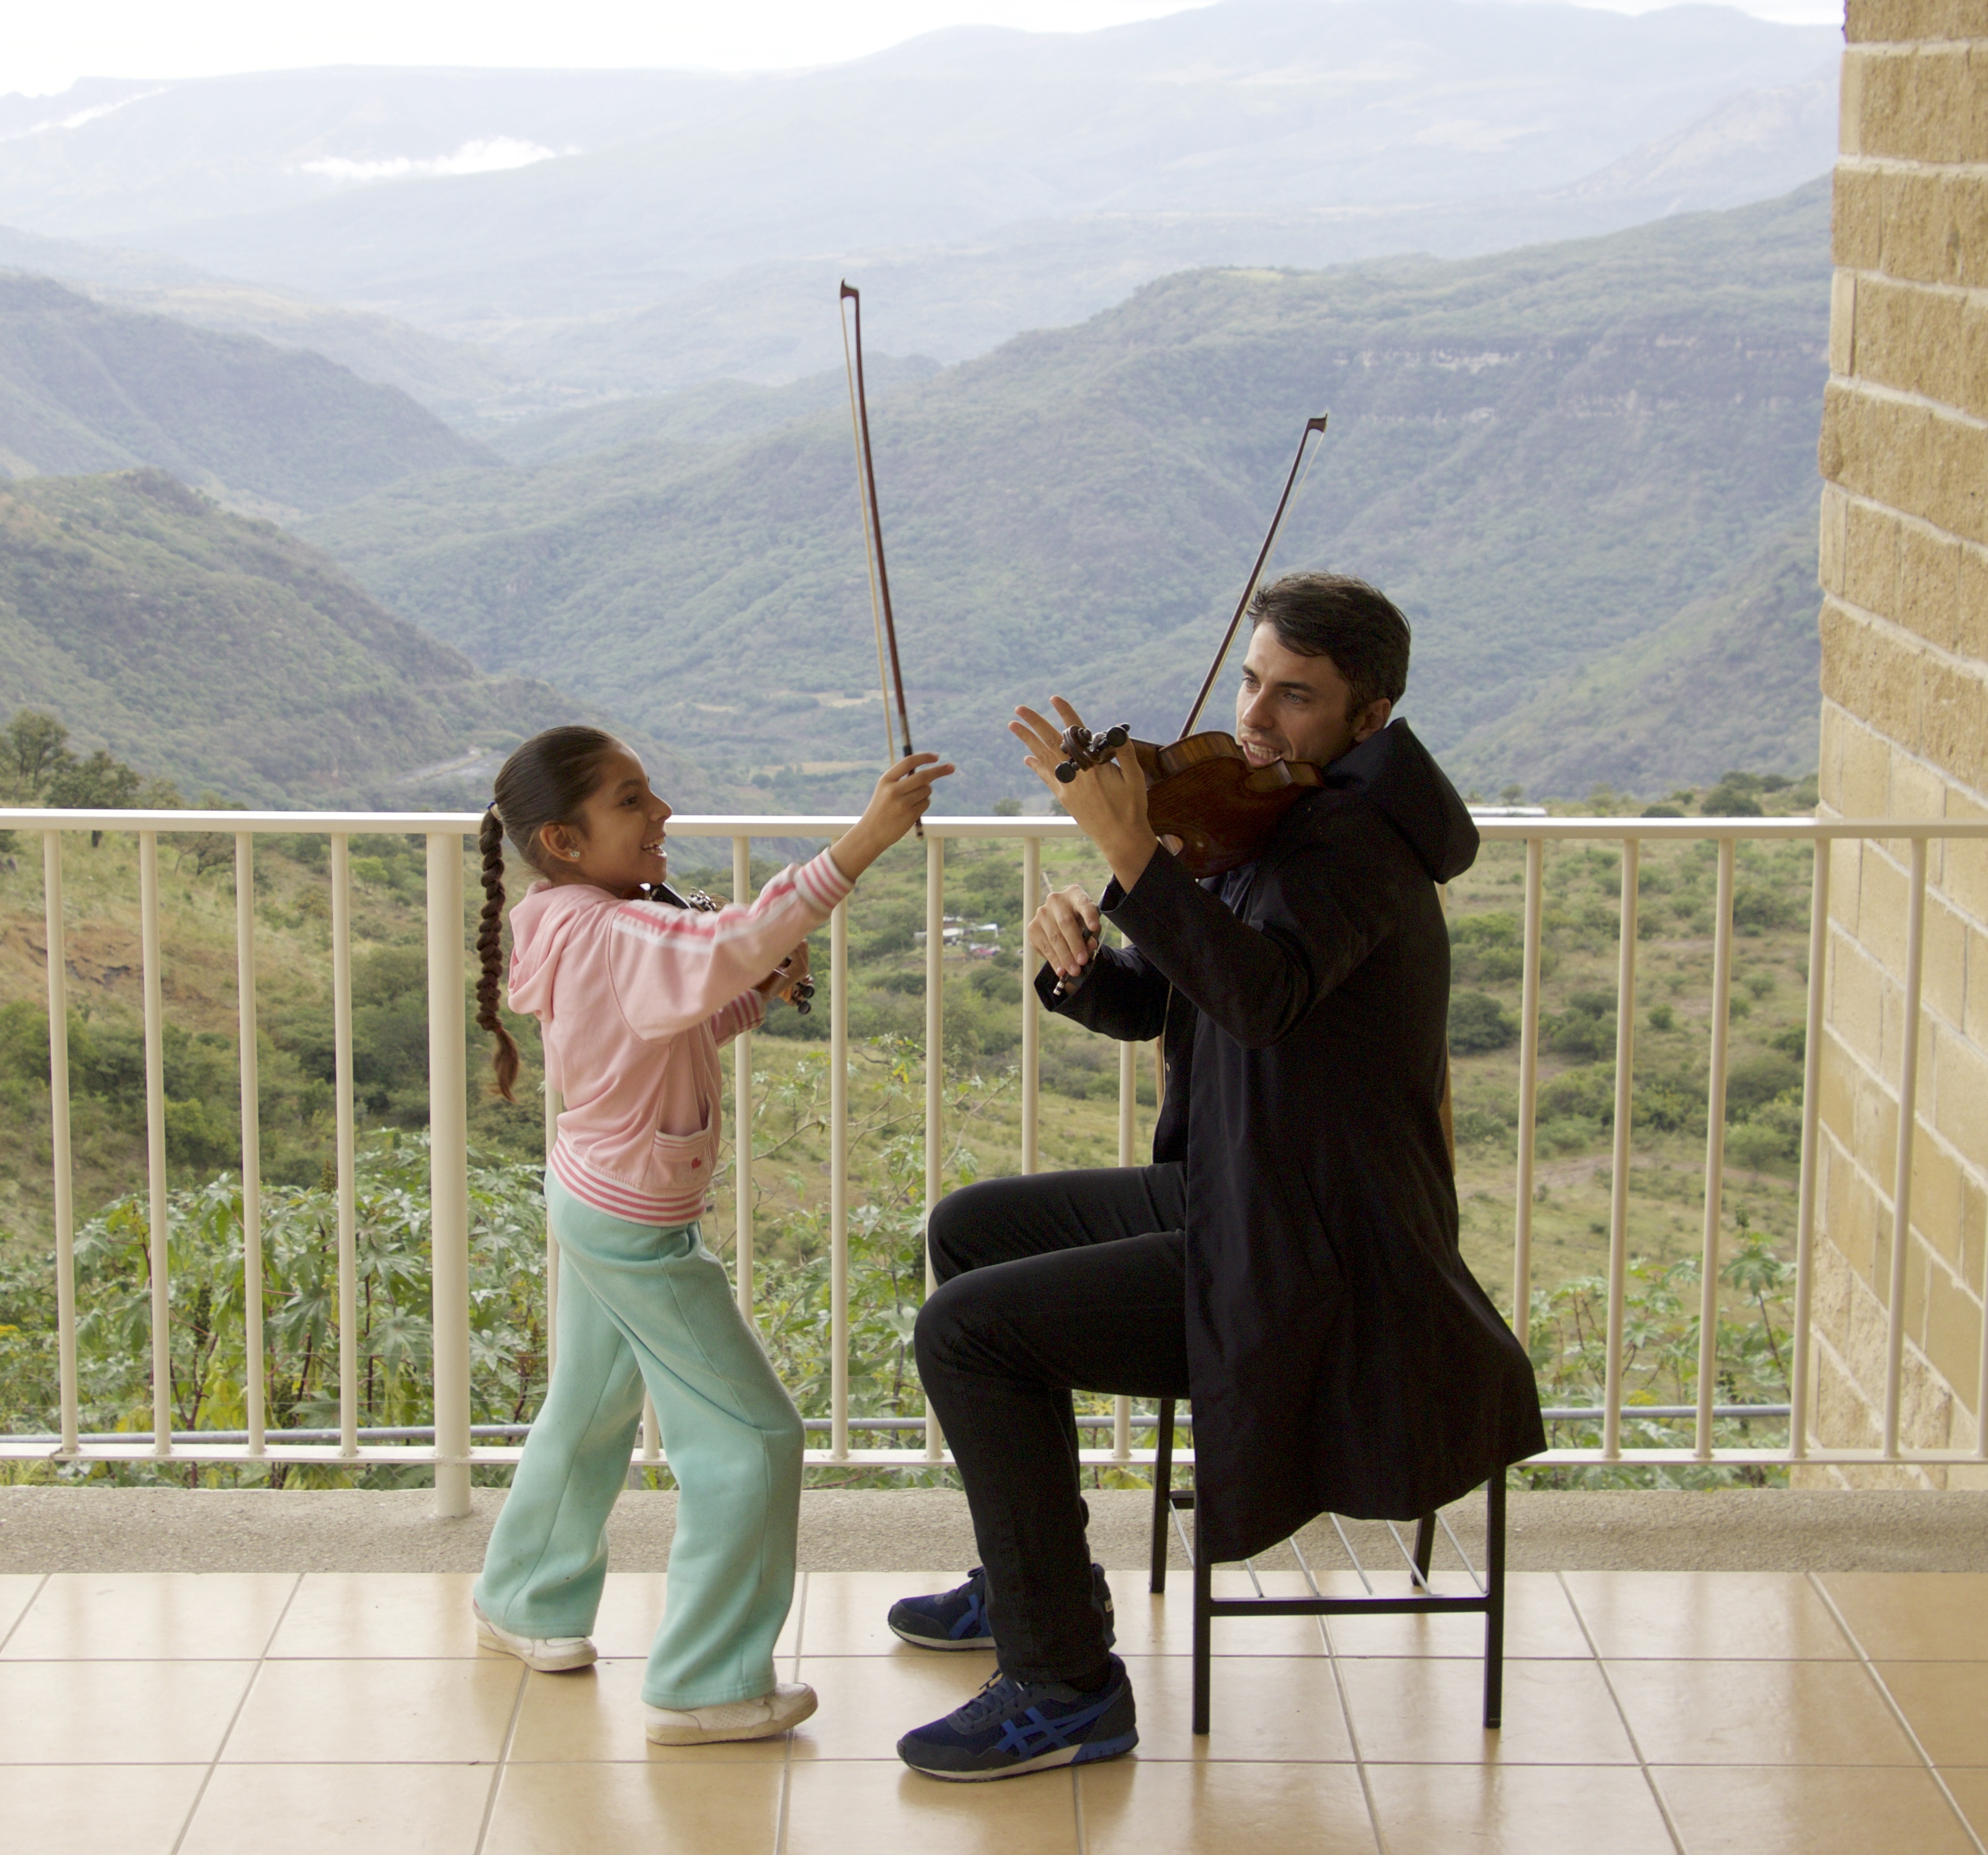 11Anette; de la Fundacion me da mi primera clase de violin